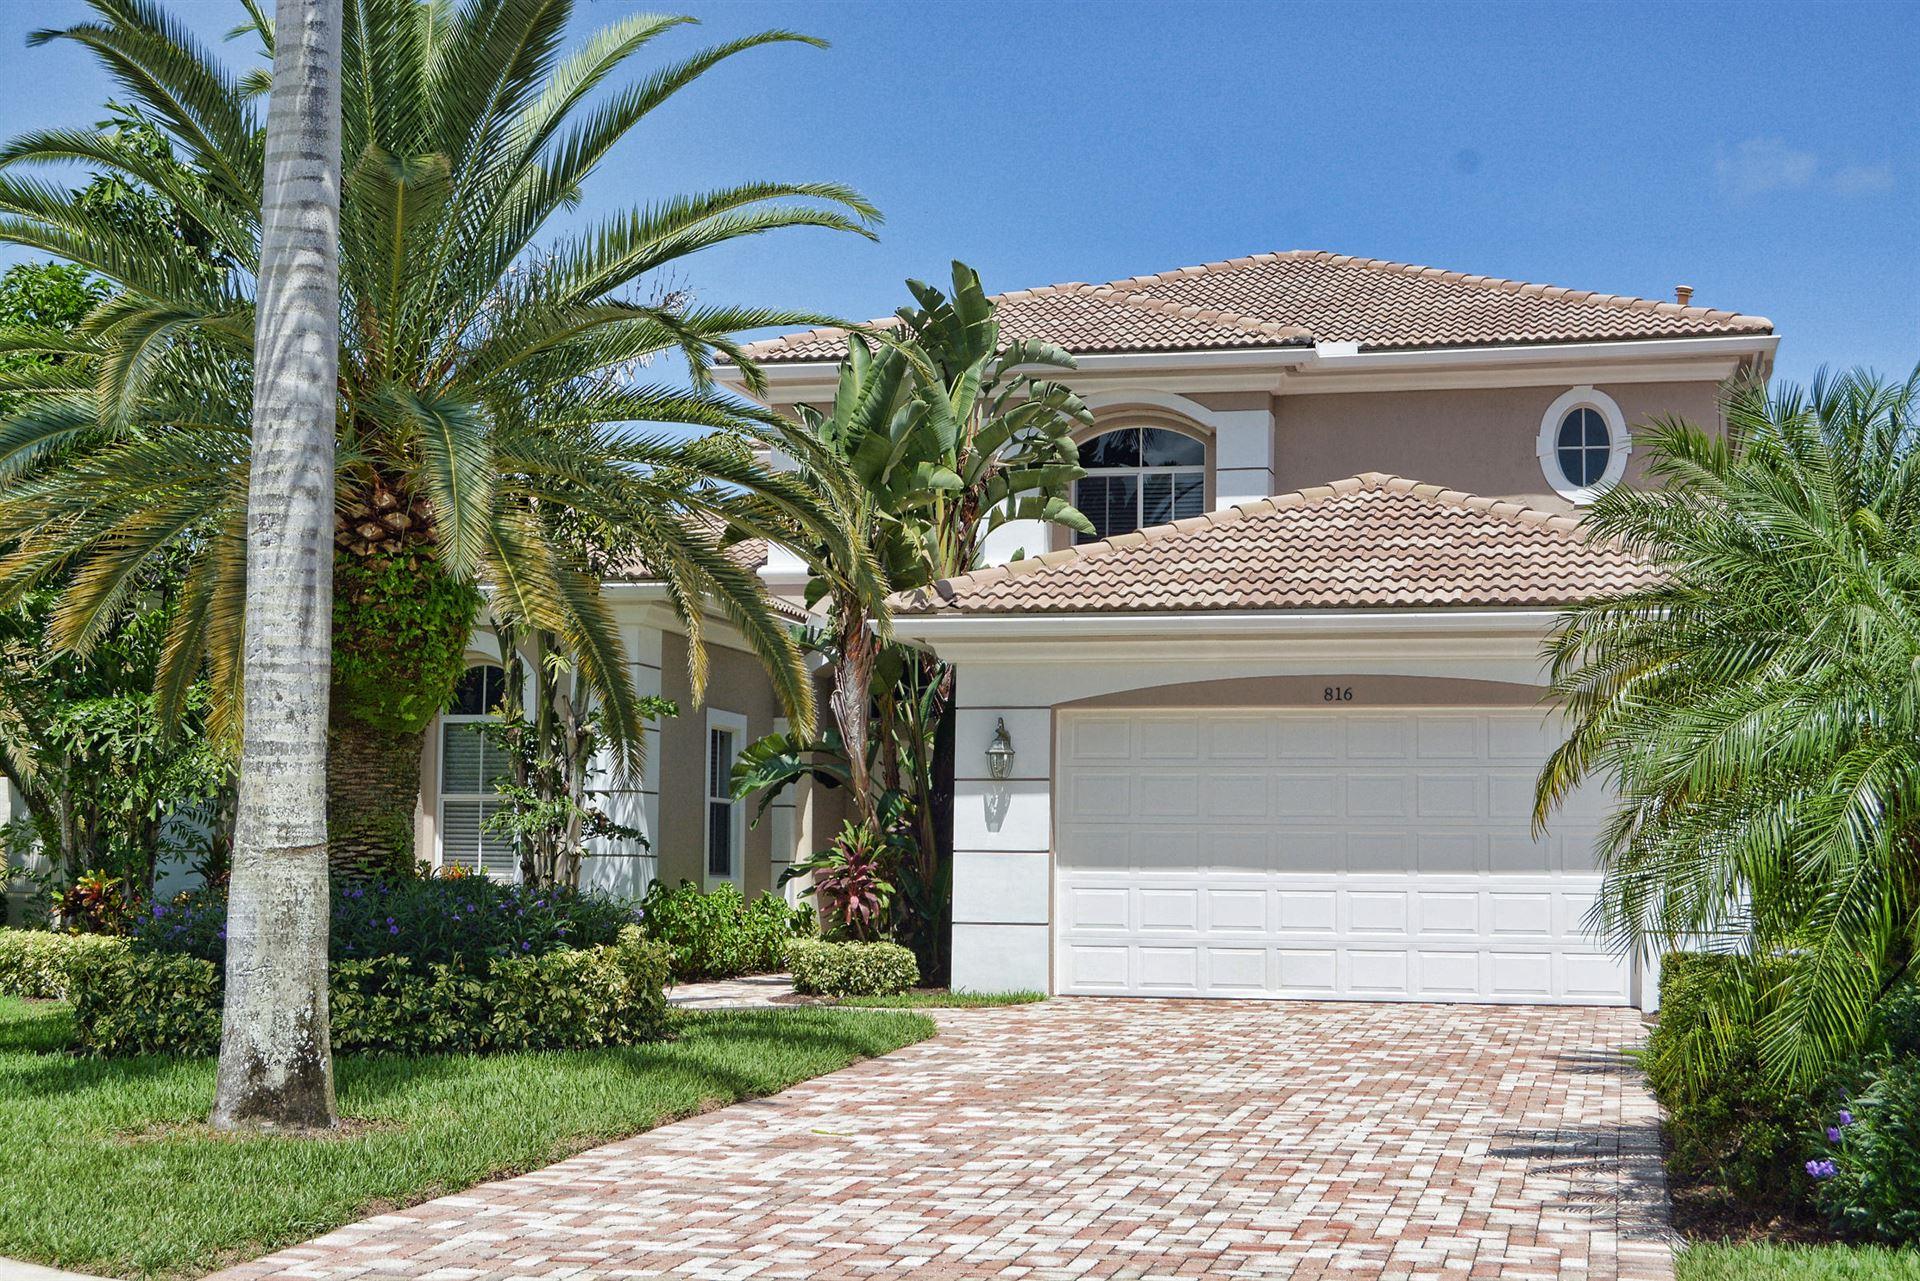 Photo of 816 Floret Drive, Palm Beach Gardens, FL 33410 (MLS # RX-10671474)